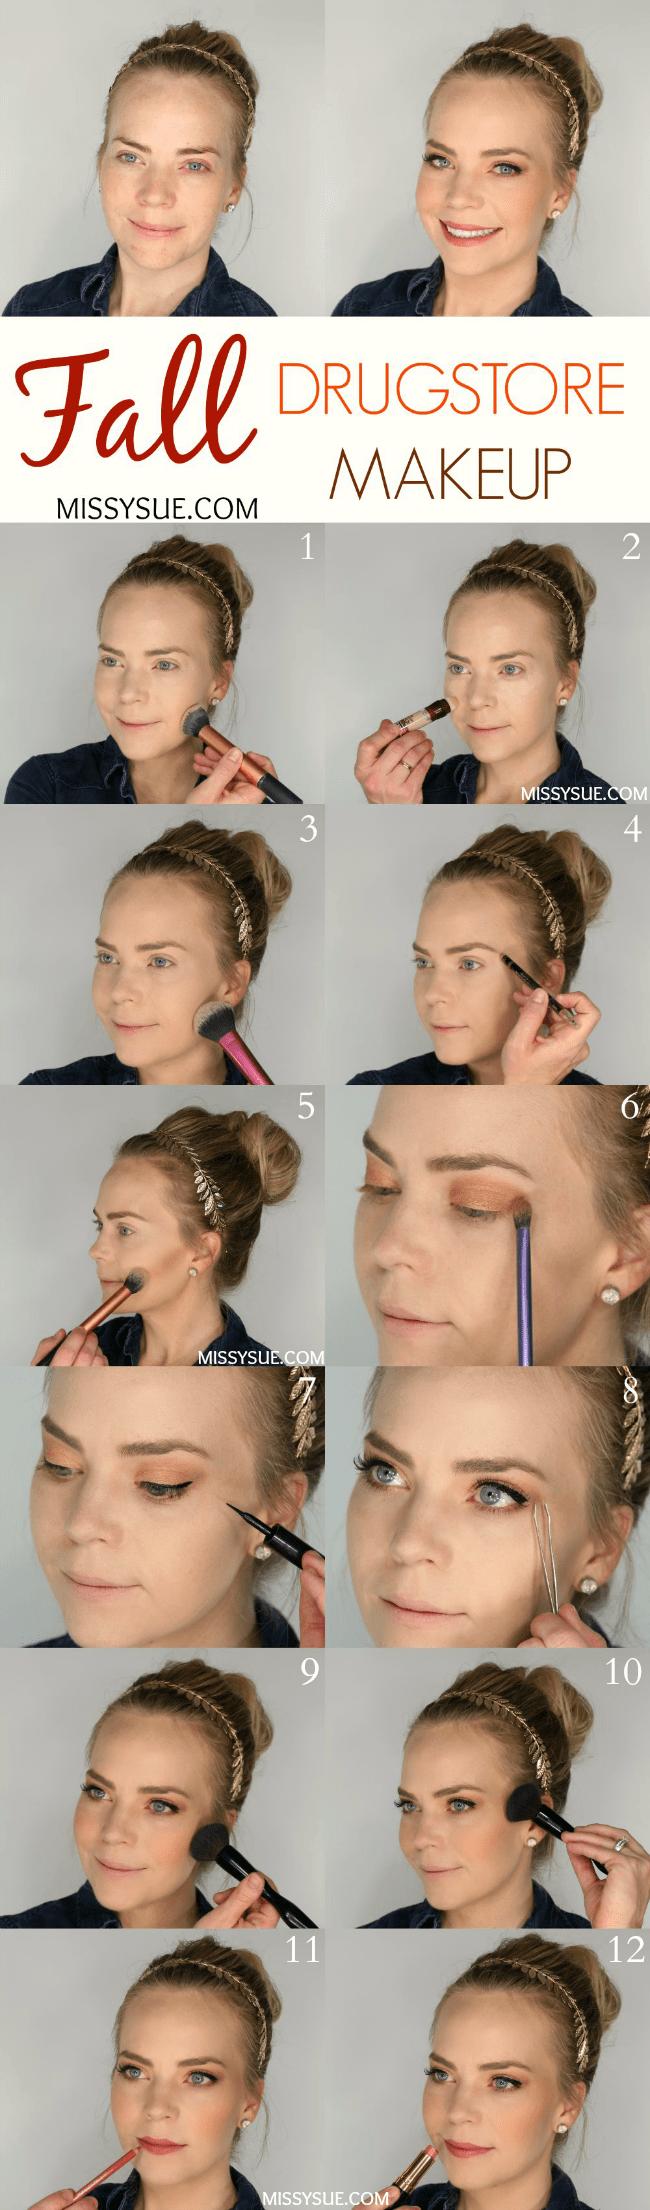 Fall Drugstore Makeup